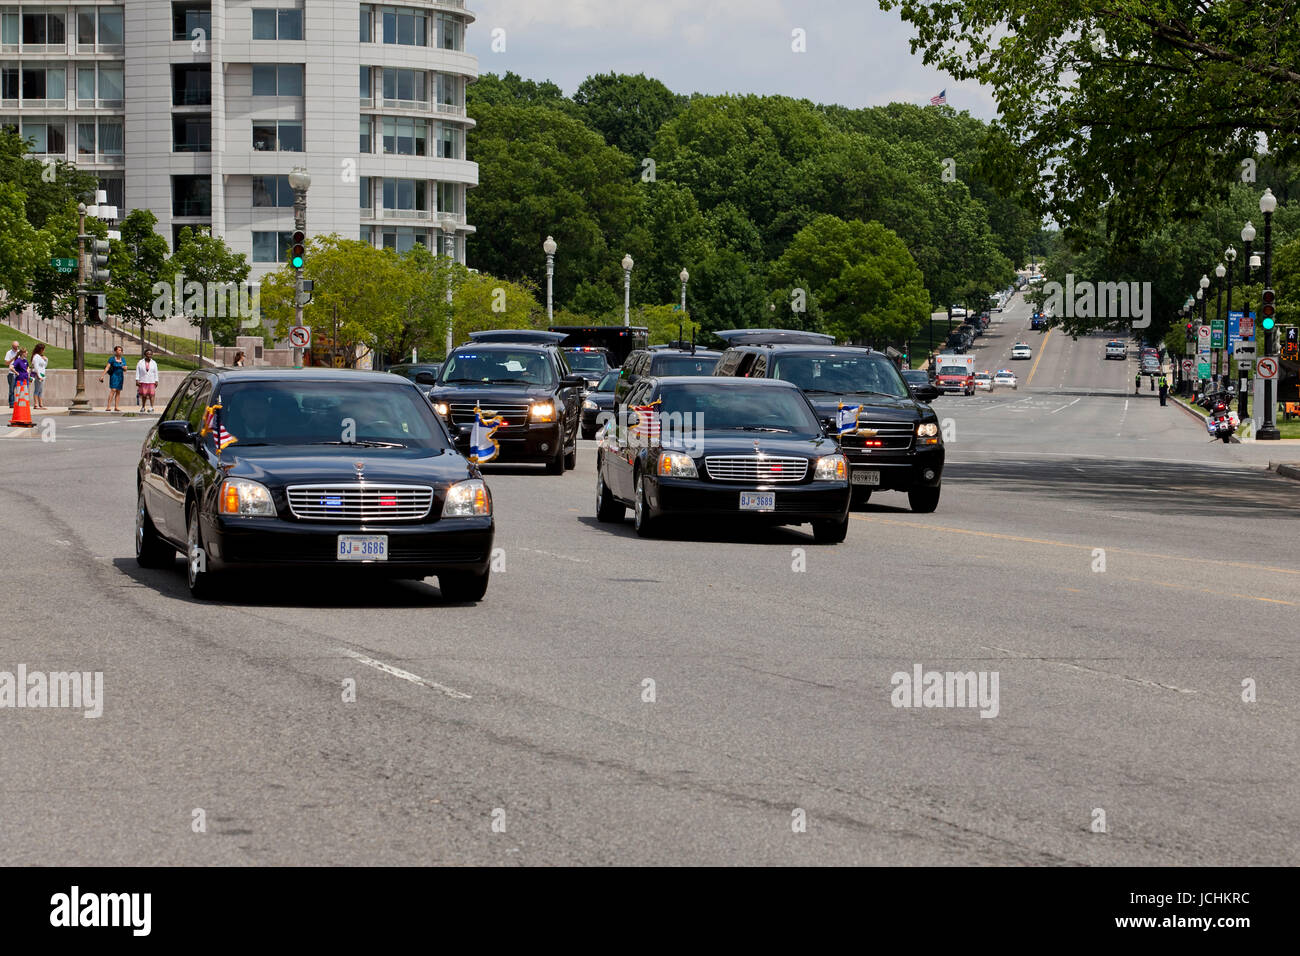 May 24, 2011, Washington, DC USA: Israeli Prime Minister Benjamin Netanyahu motorcade leaving US Capitol, after - Stock Image